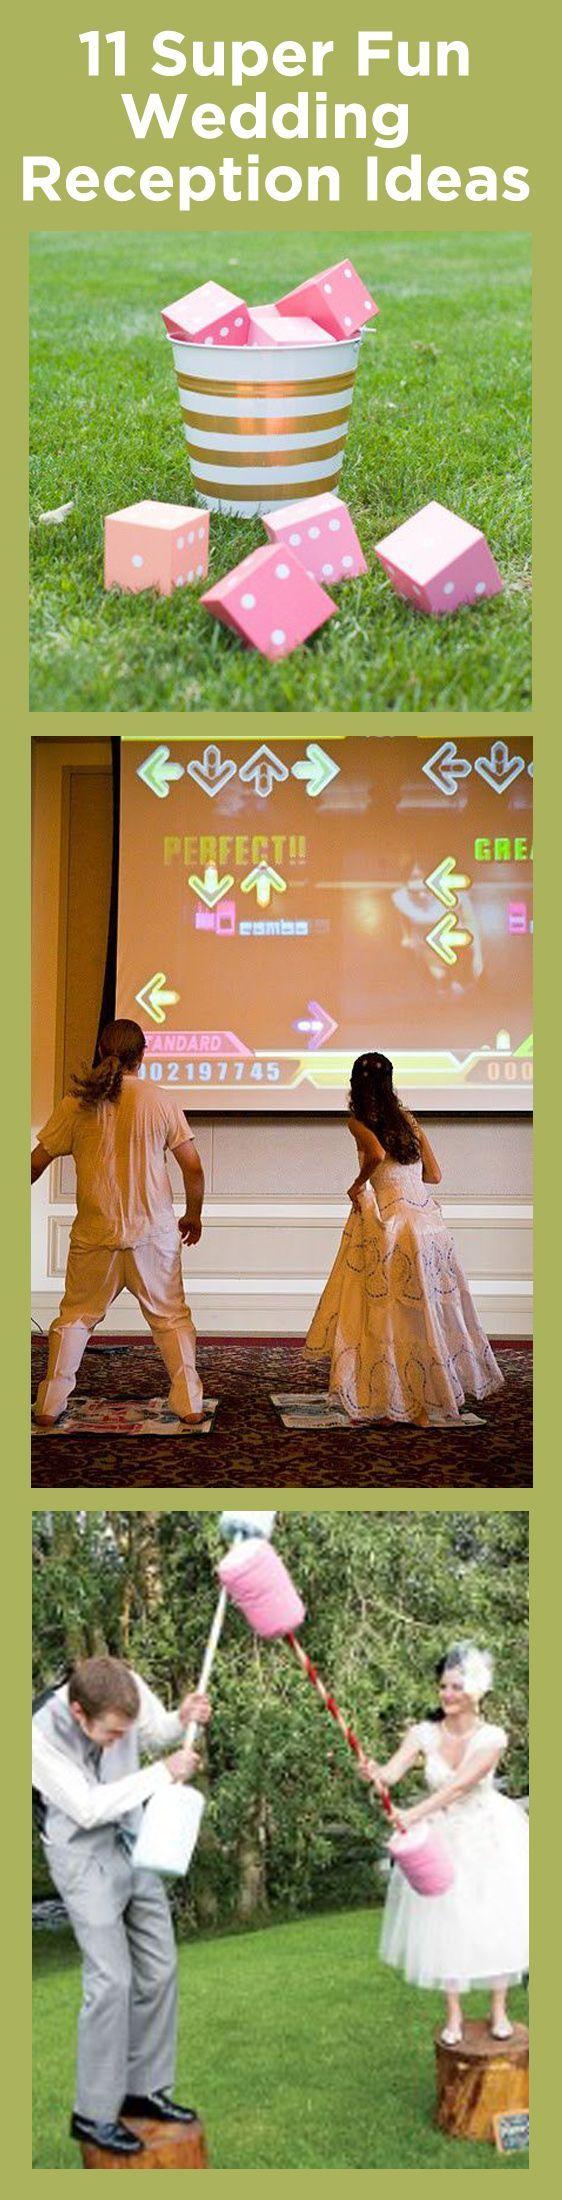 234 Best Wedding Reception Ideas Images On Pinterest Bridal